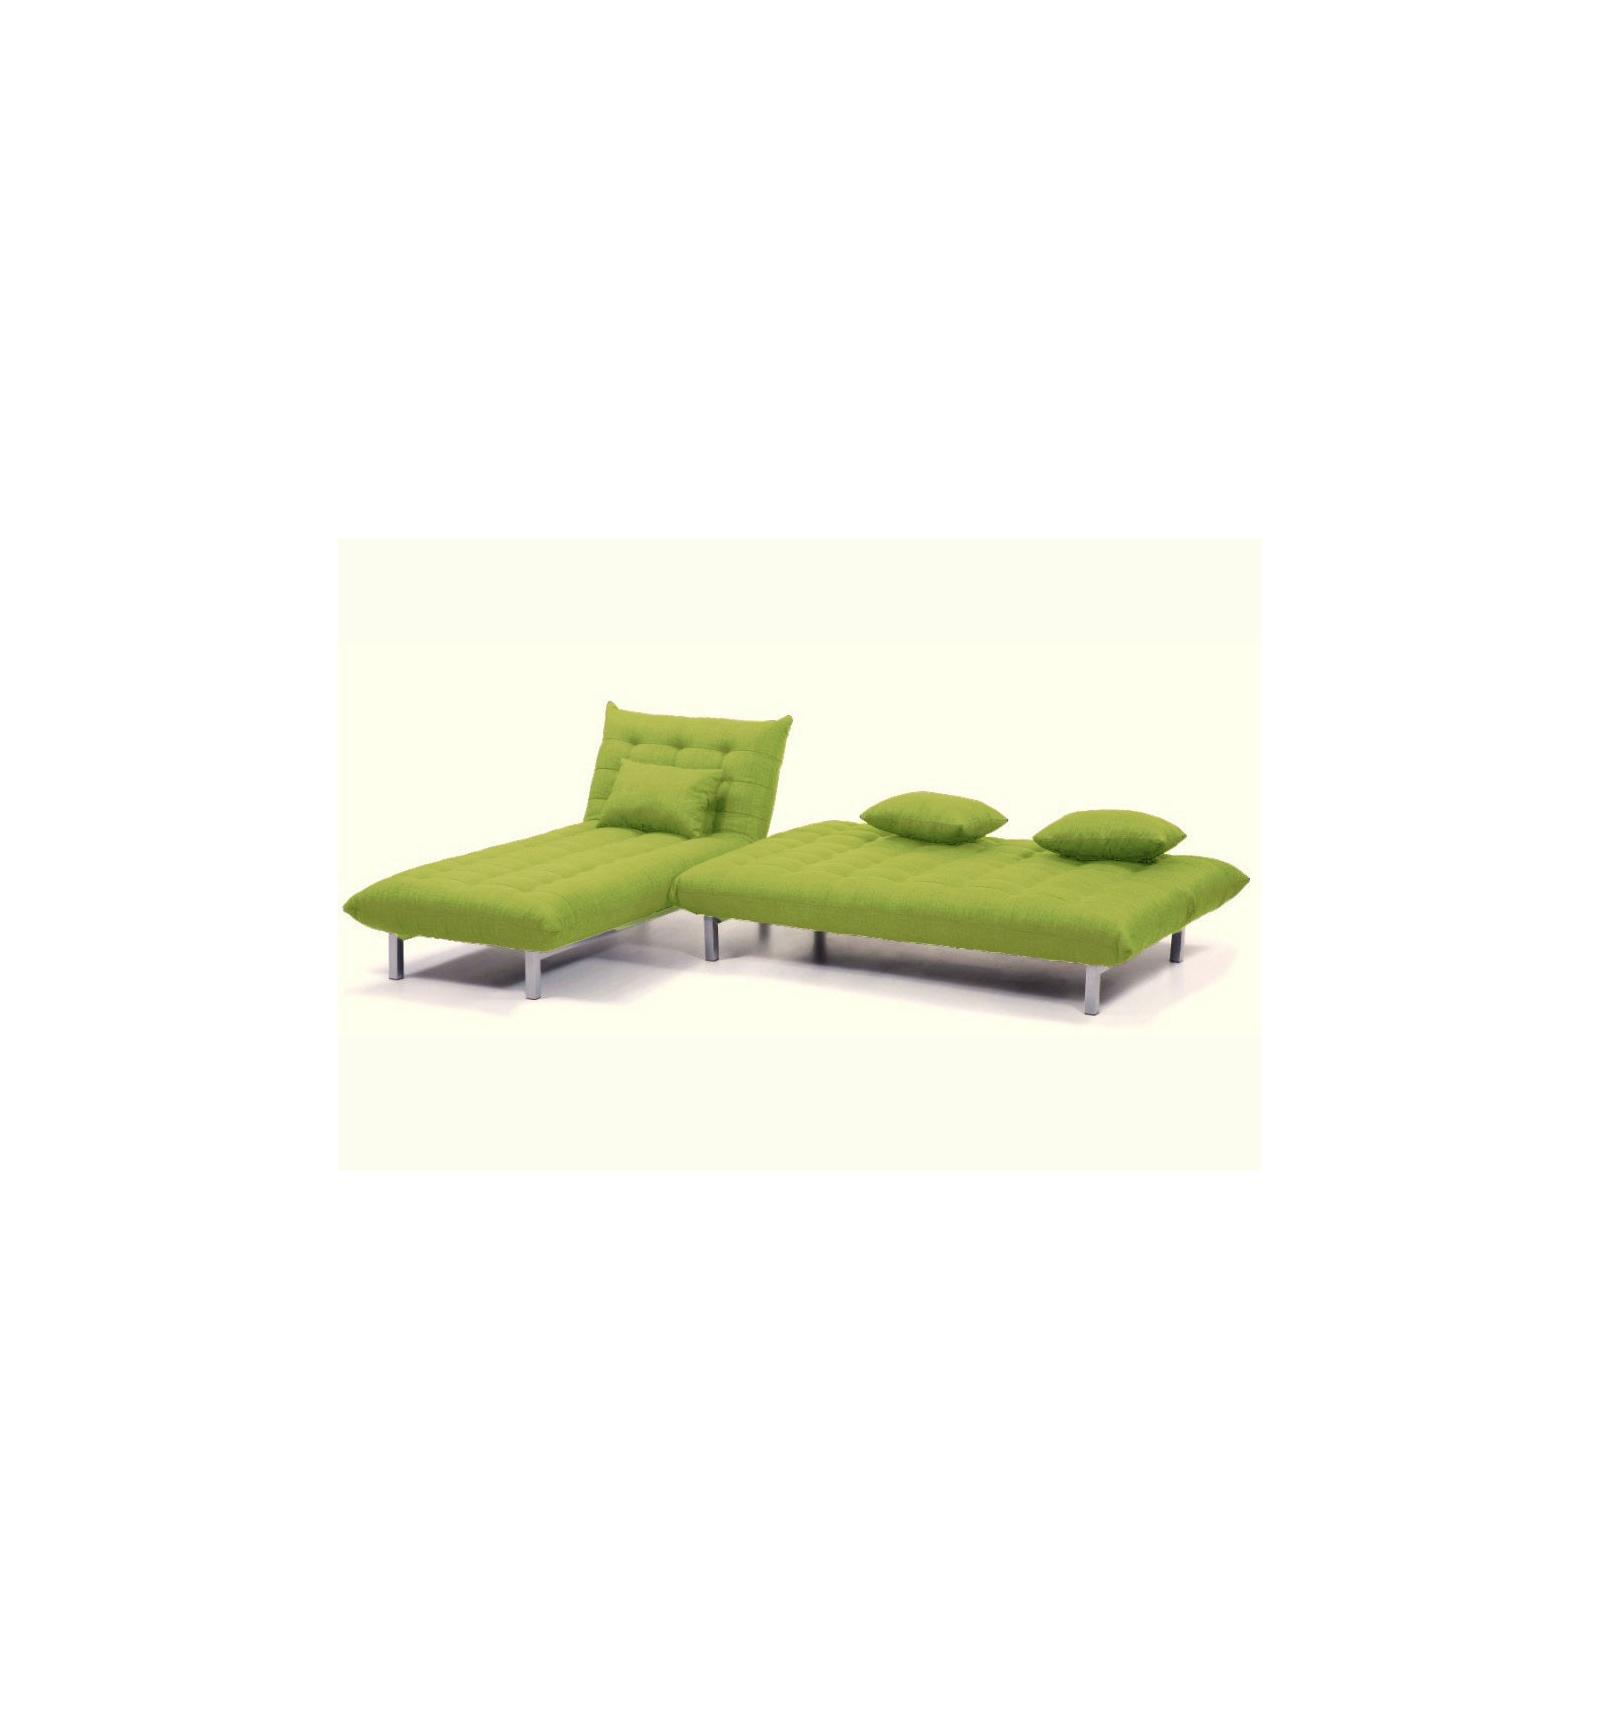 Divano letto chaise longue for Divano chaise longue